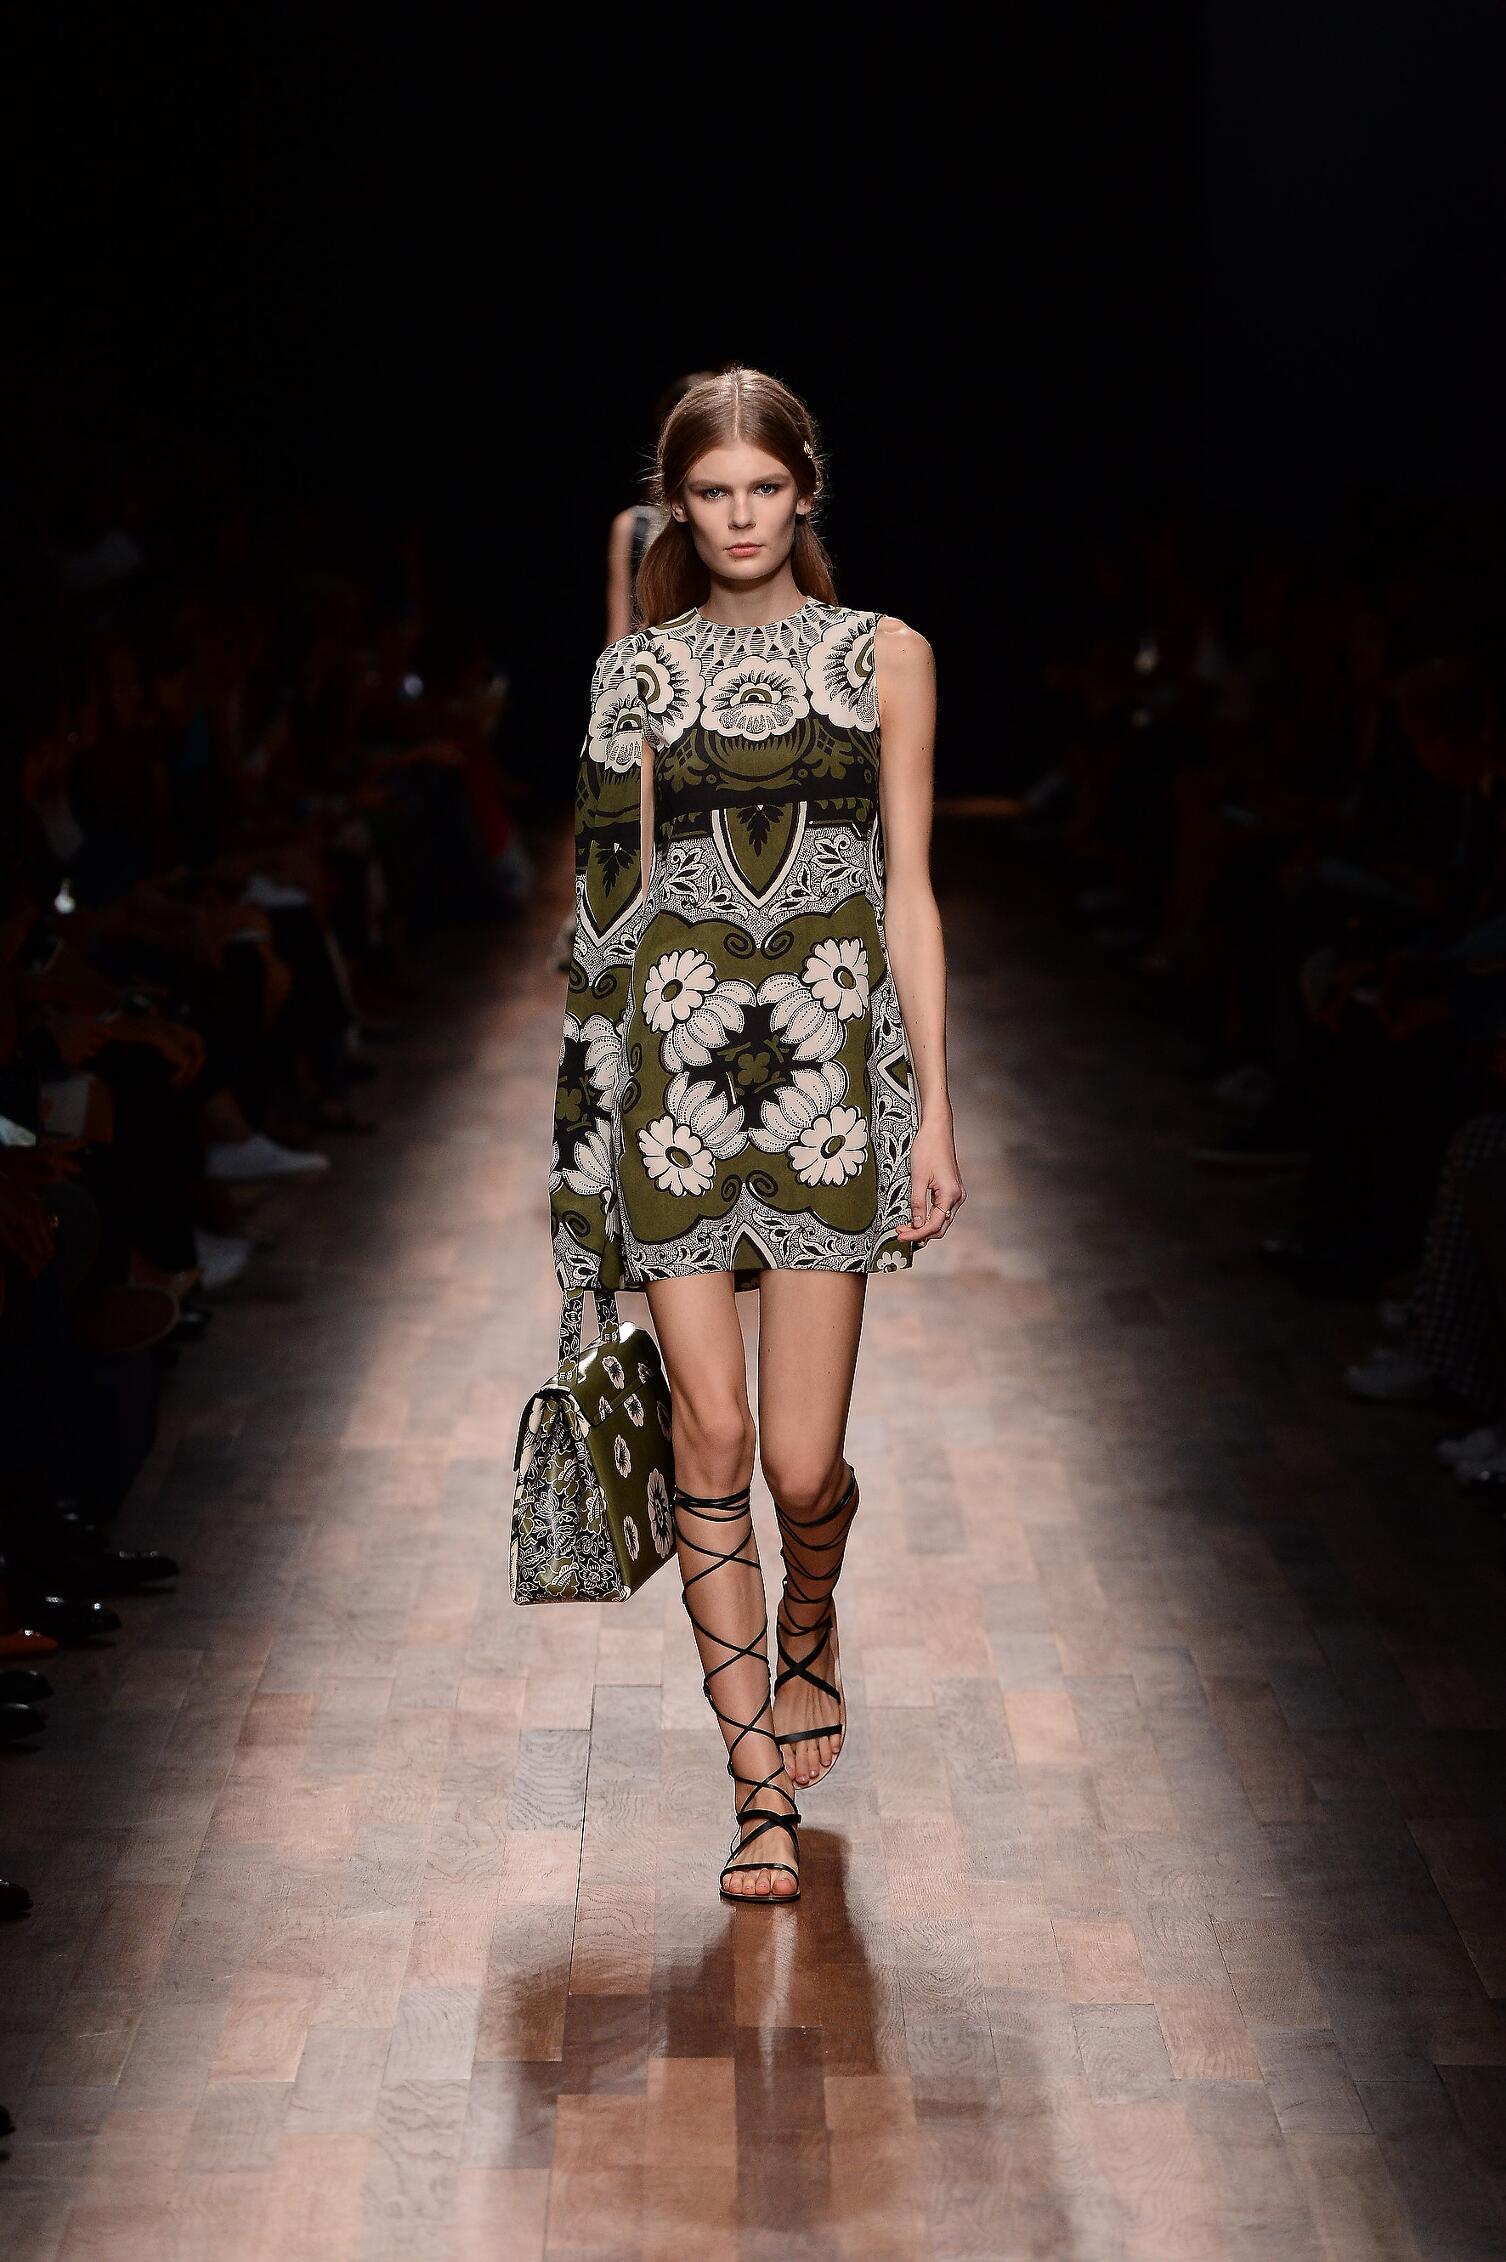 Fashion Woman Model Valentino Catwalk